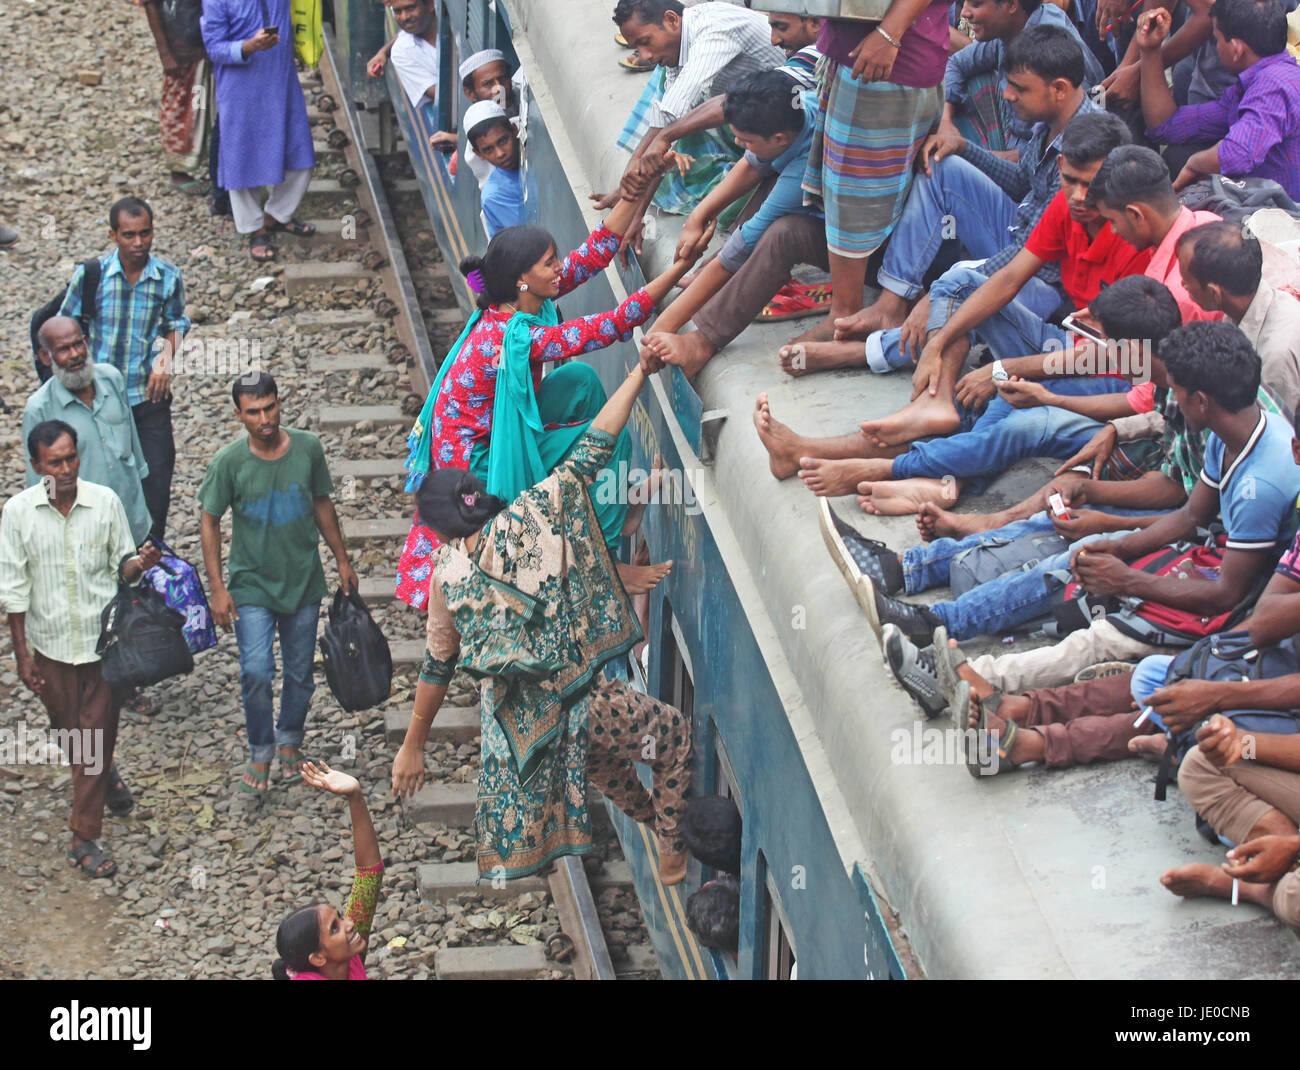 Dhaka, Bangladesh. 22nd Jun, 2017. Bangladeshis cram onto a train as they travel home to be with their families Stock Photo